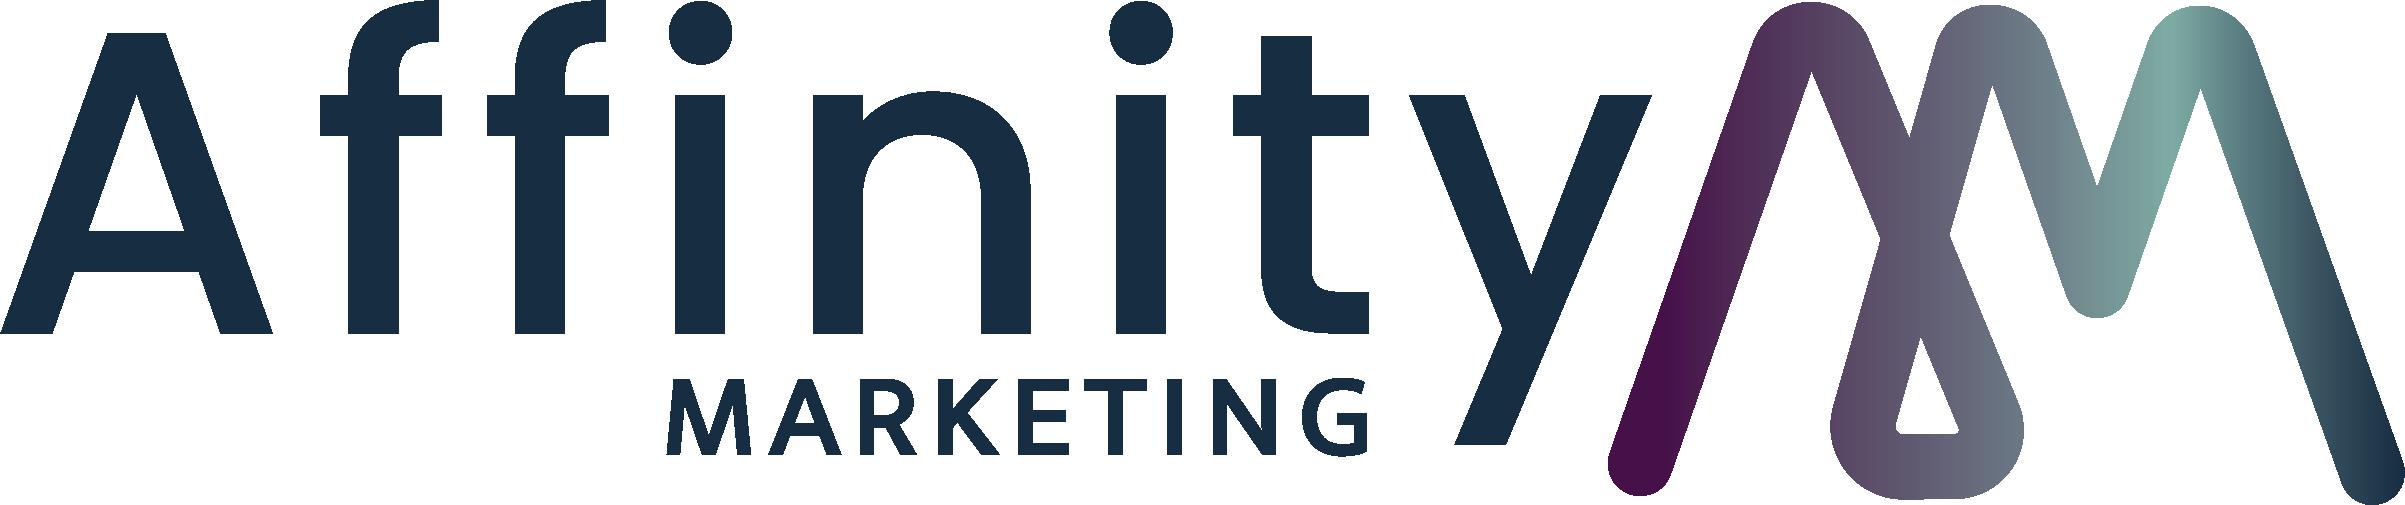 Affinity Marketing